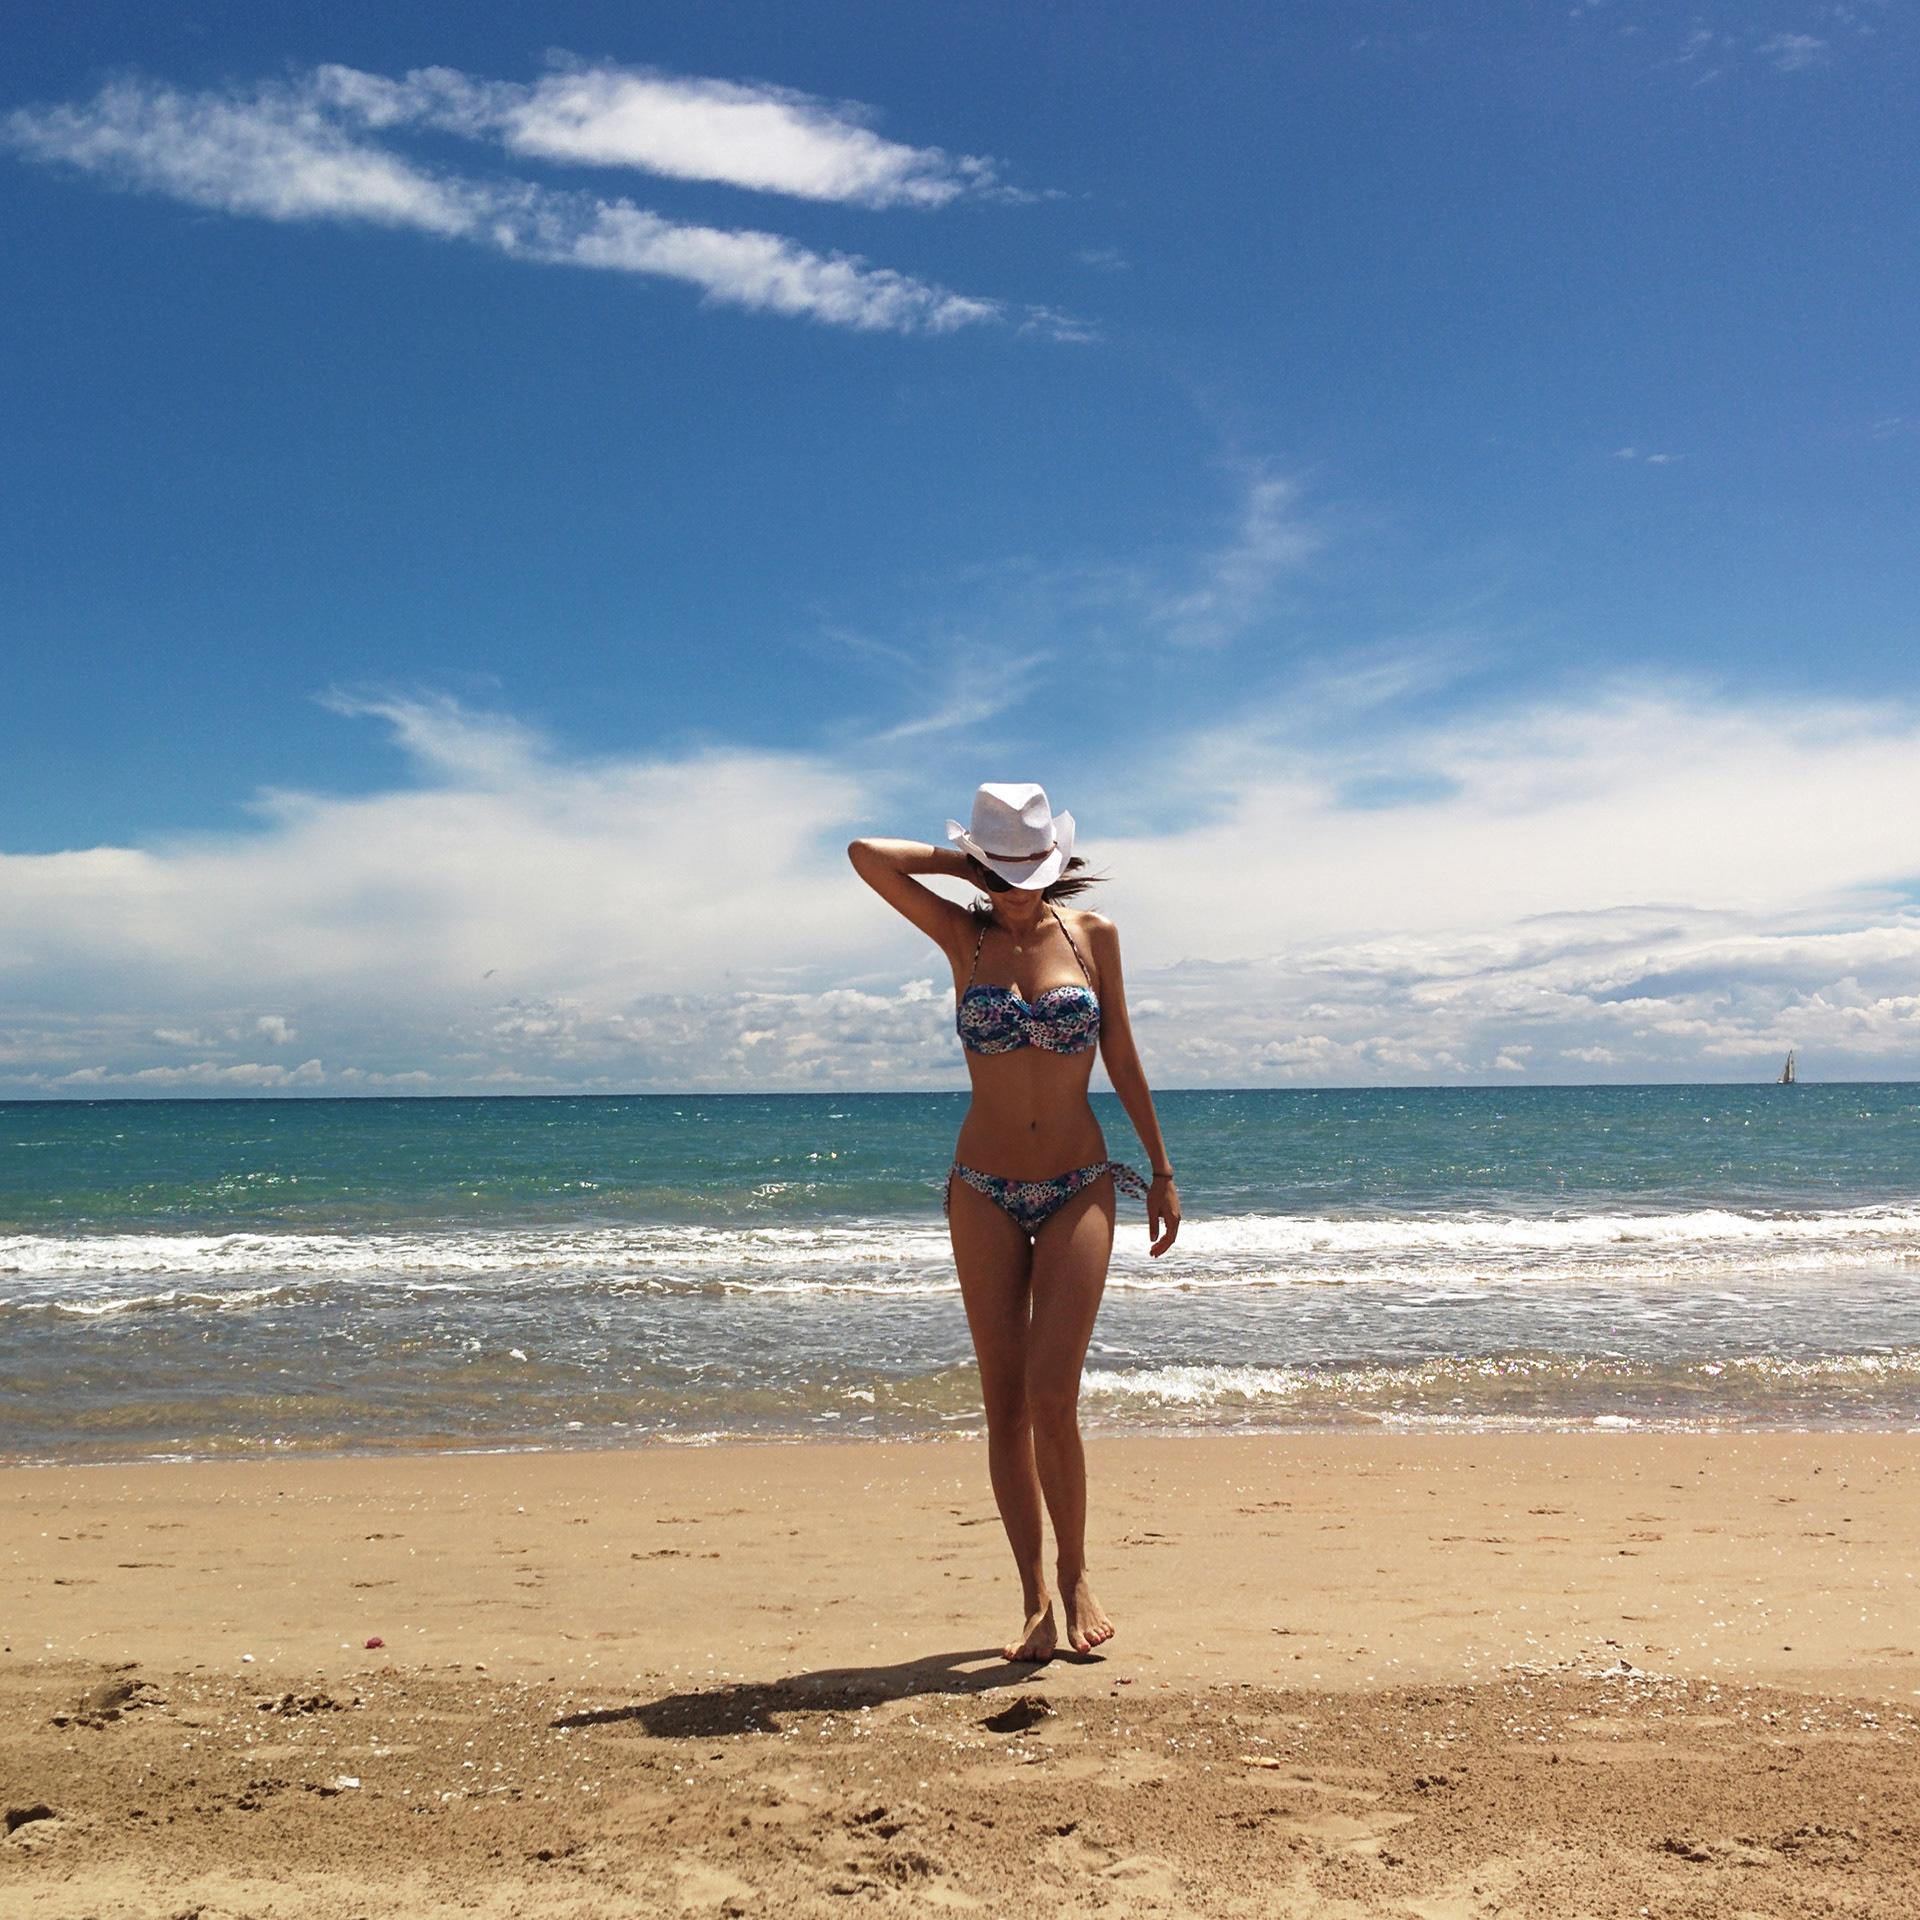 Mara Frischherz - fit the mold, at the beach